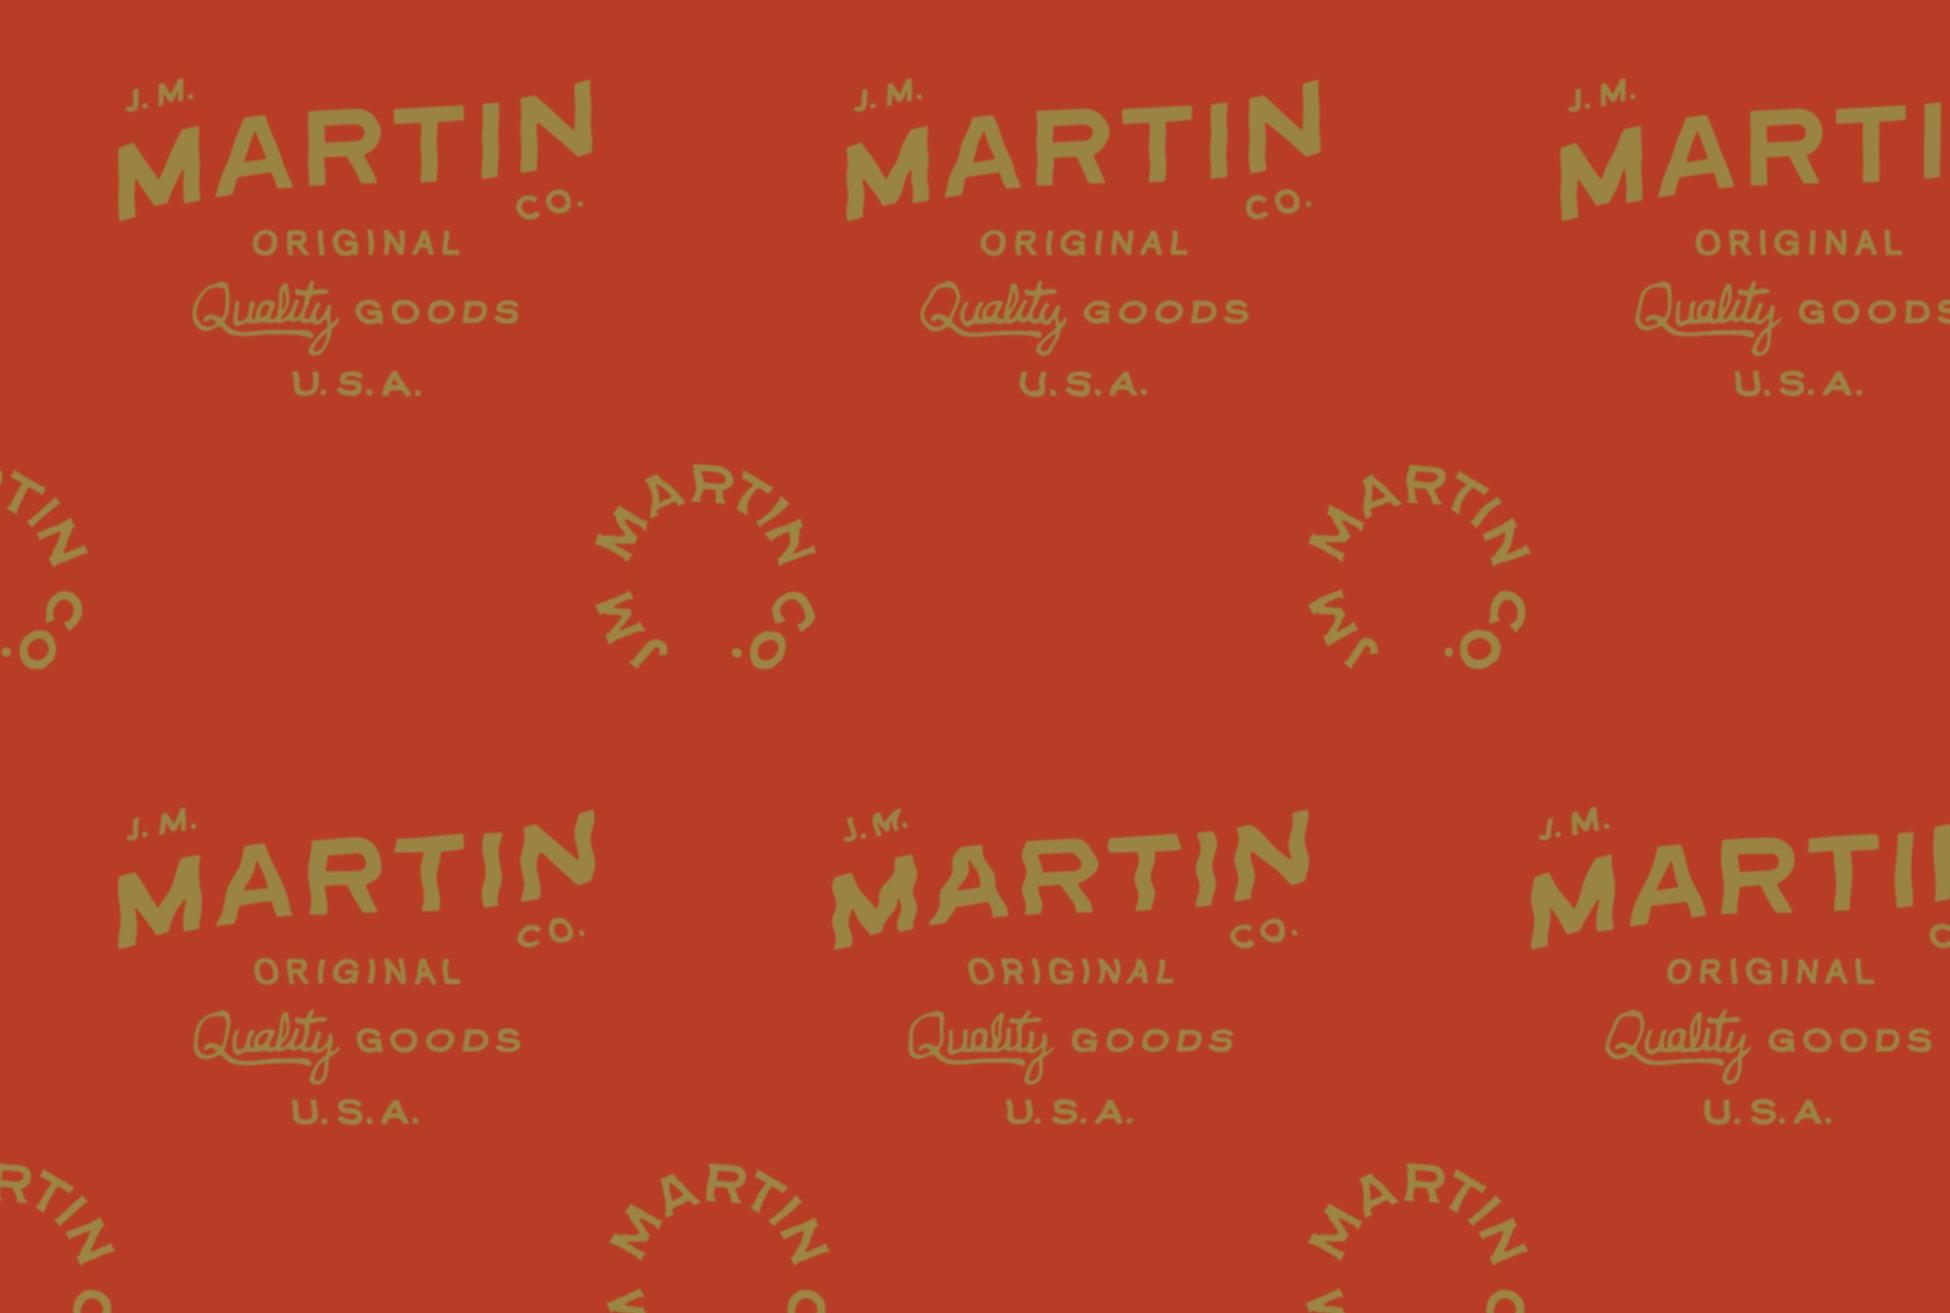 jmmartin_identity-pattern.jpg